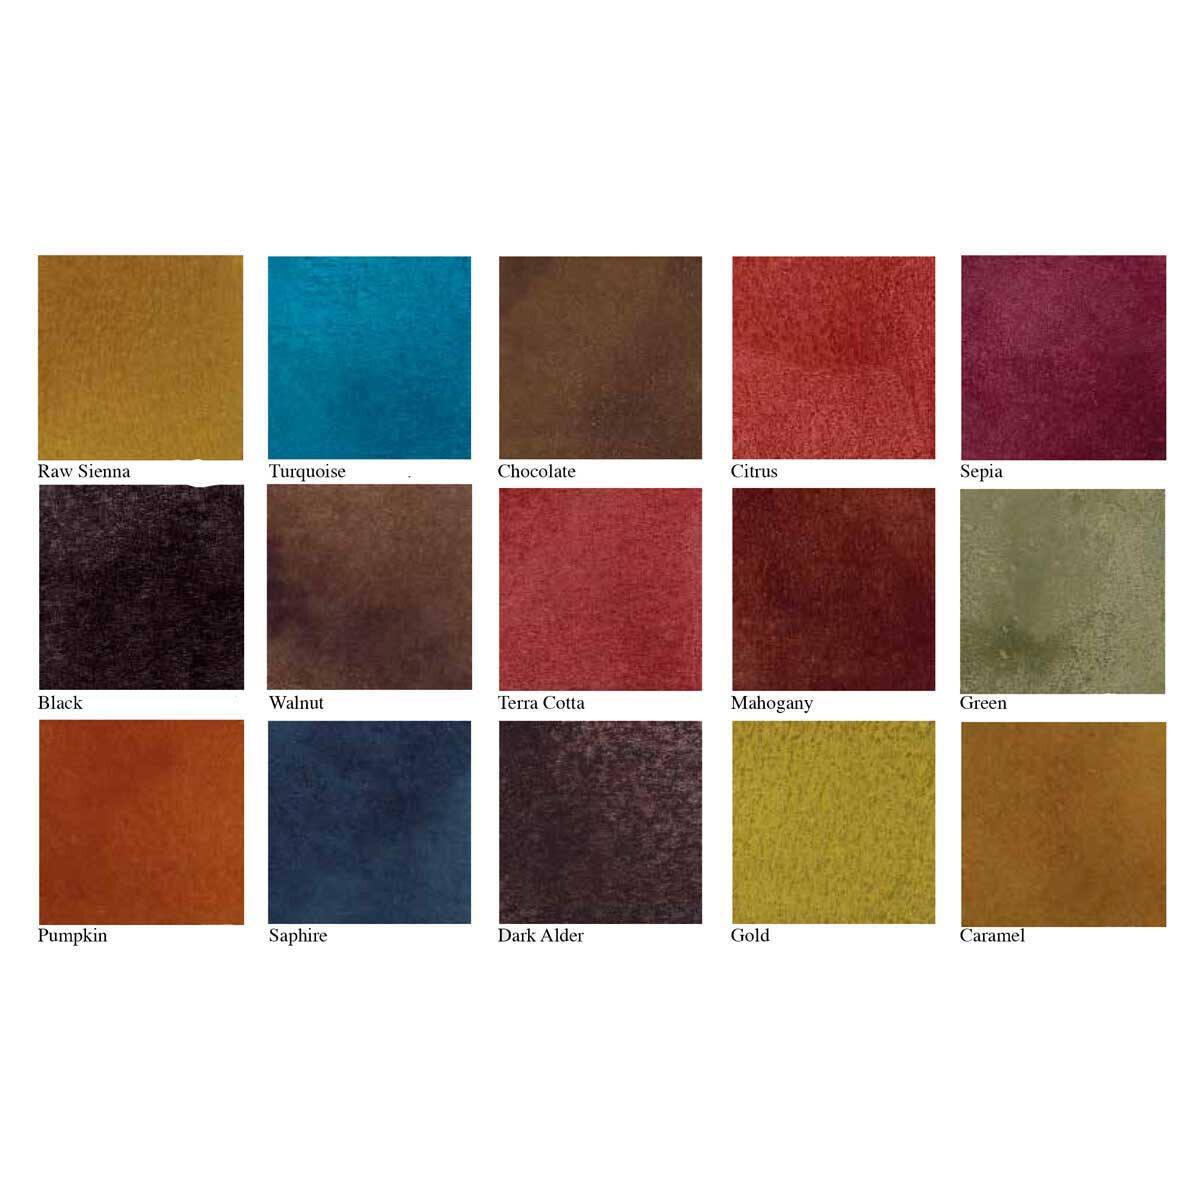 Laticrete Spartacote Vivid Dye for Epoxy Floors